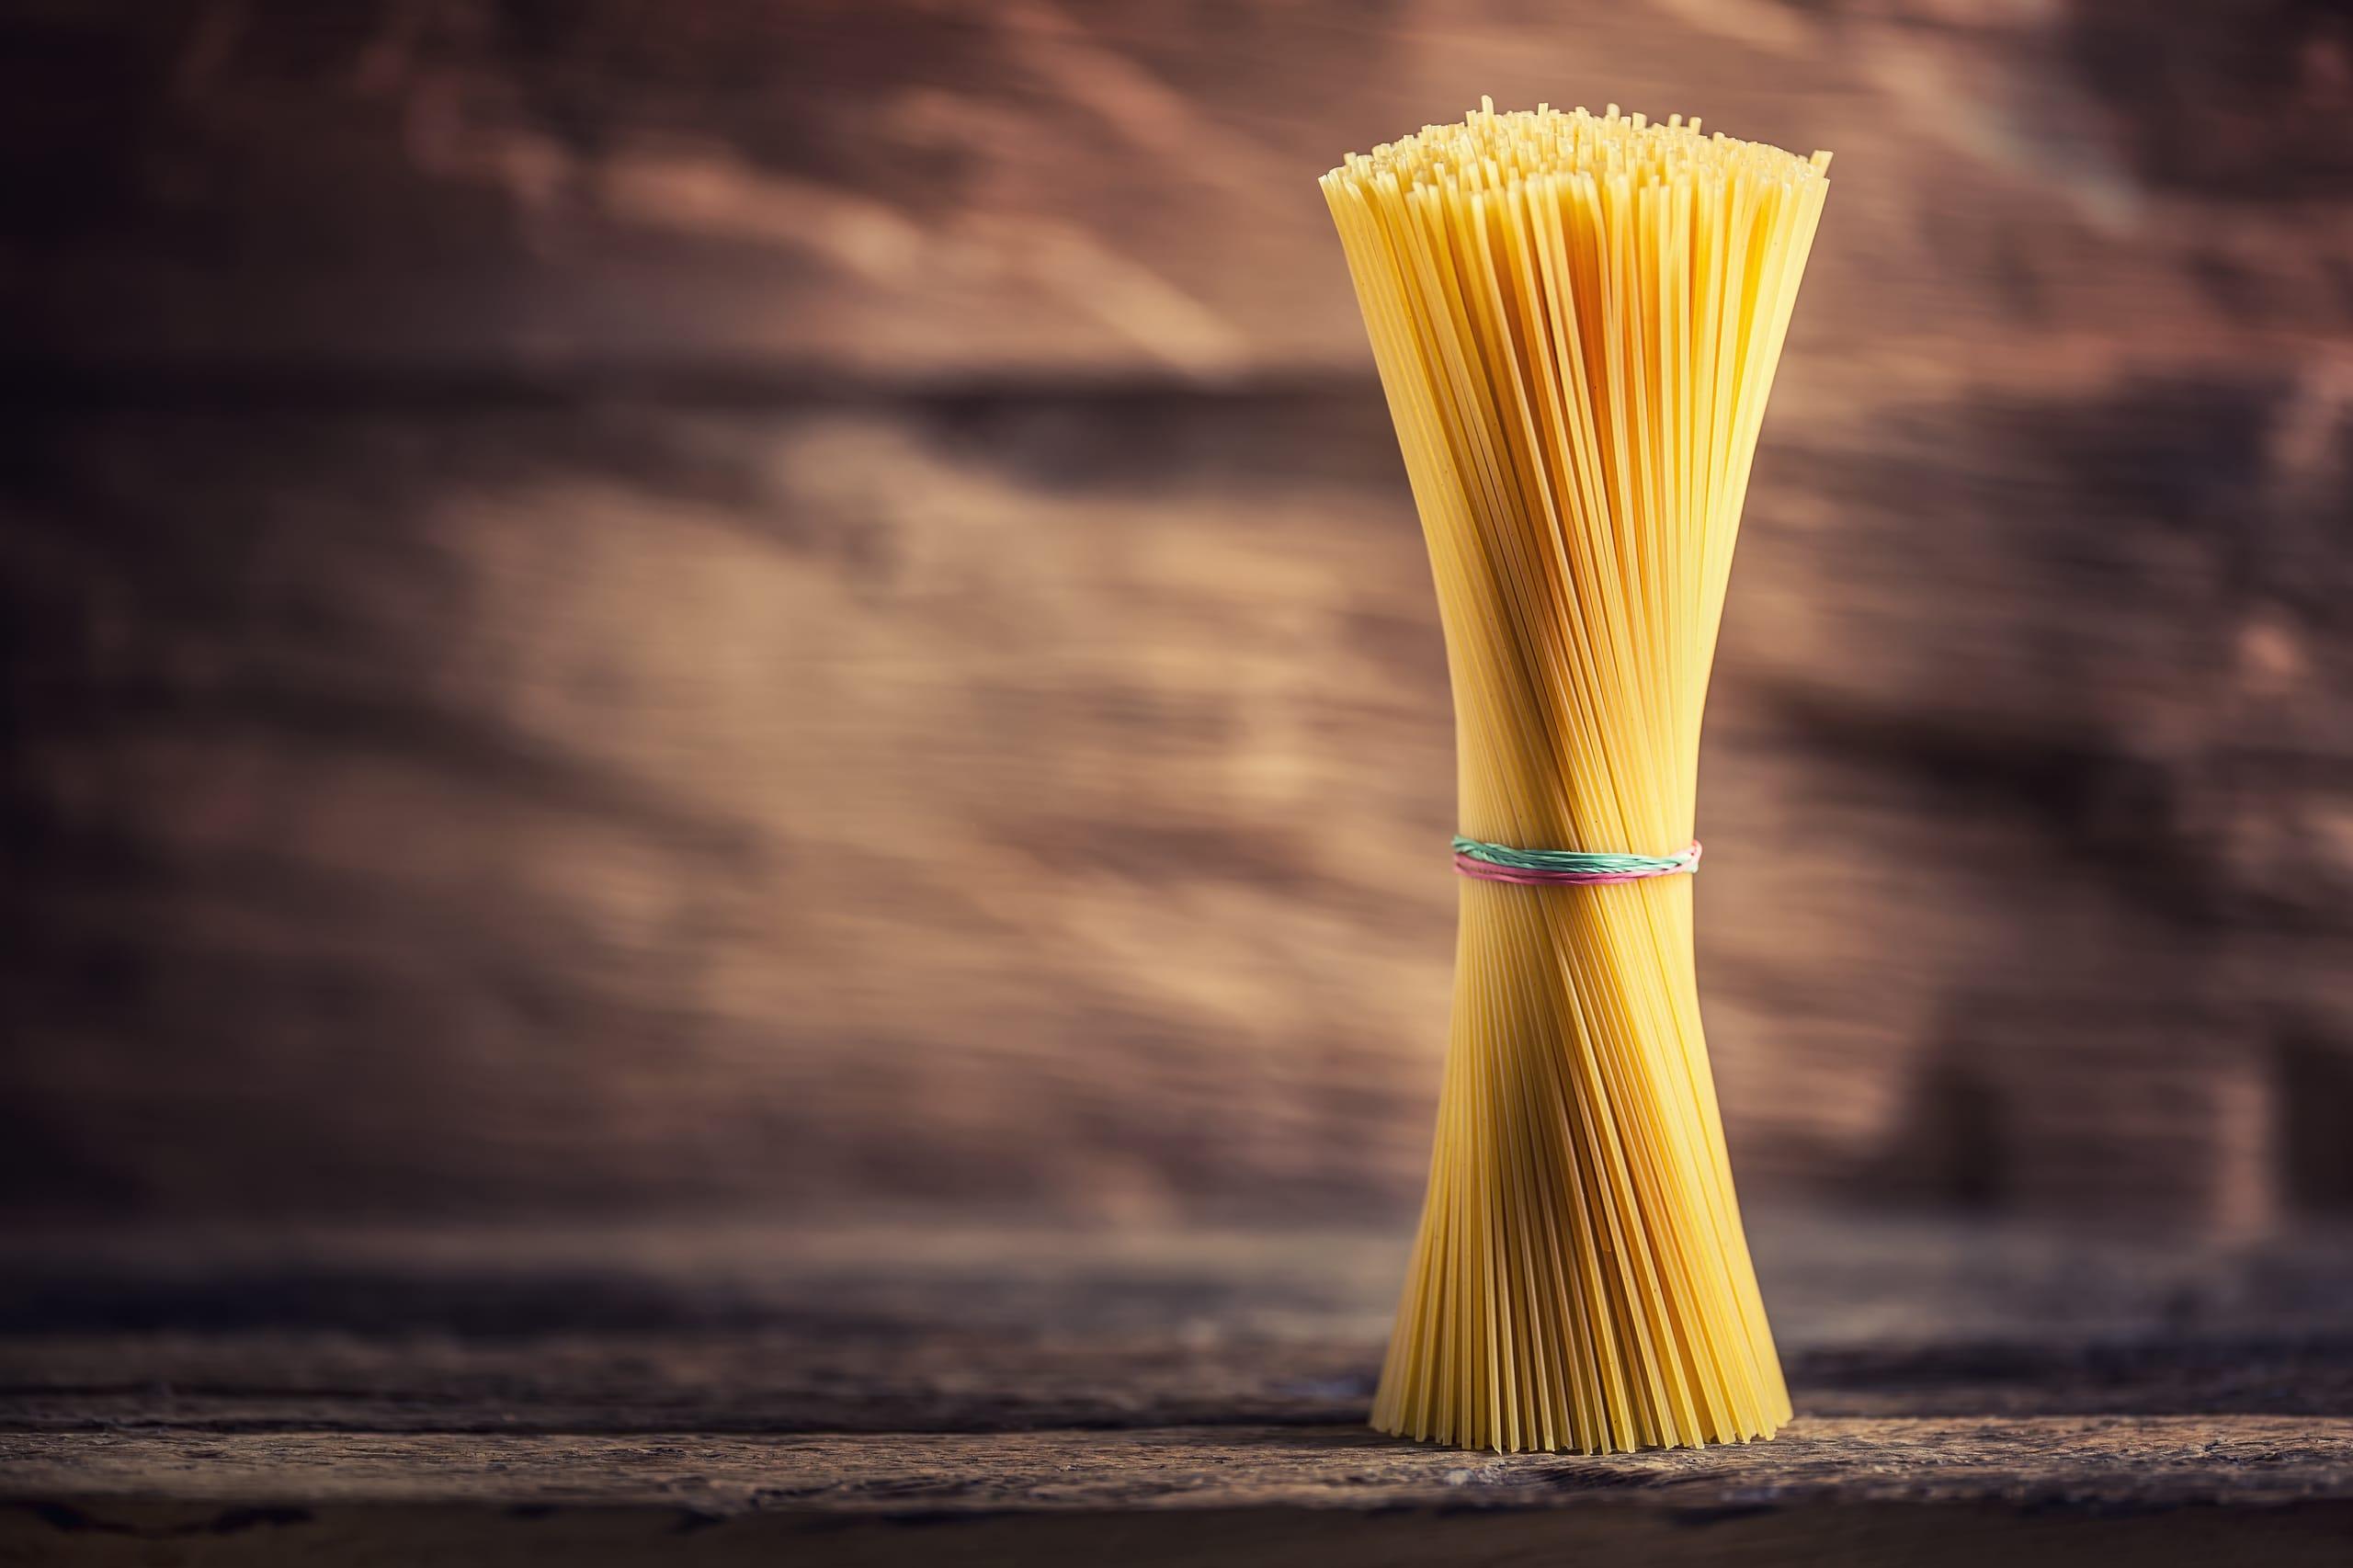 Spaghetti. Pasta spaghetti on rustic wooden background.